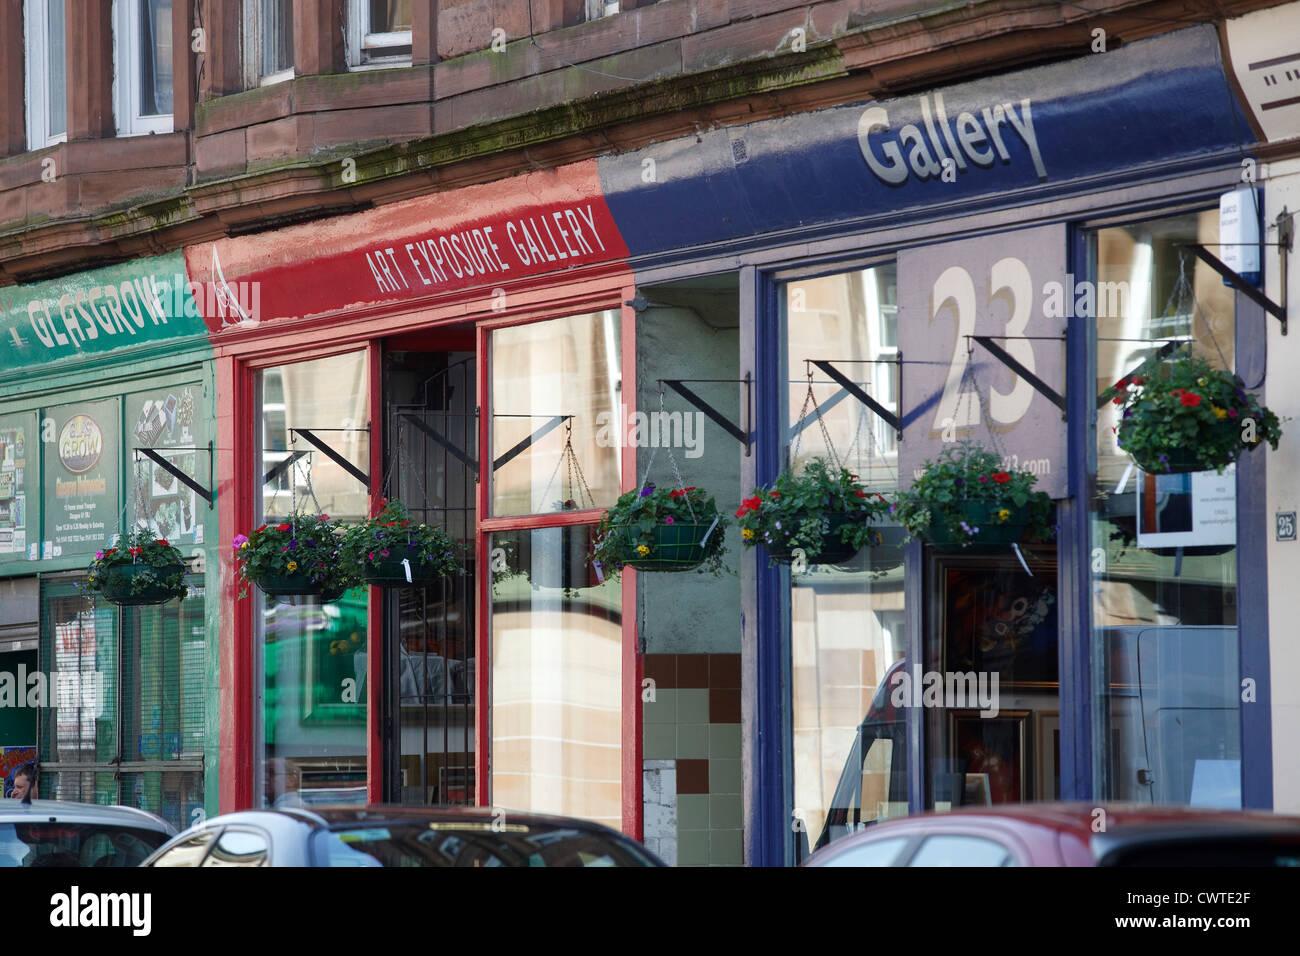 Galleries in Parnie Street. Merchant City Area, Glasgow. - Stock Image